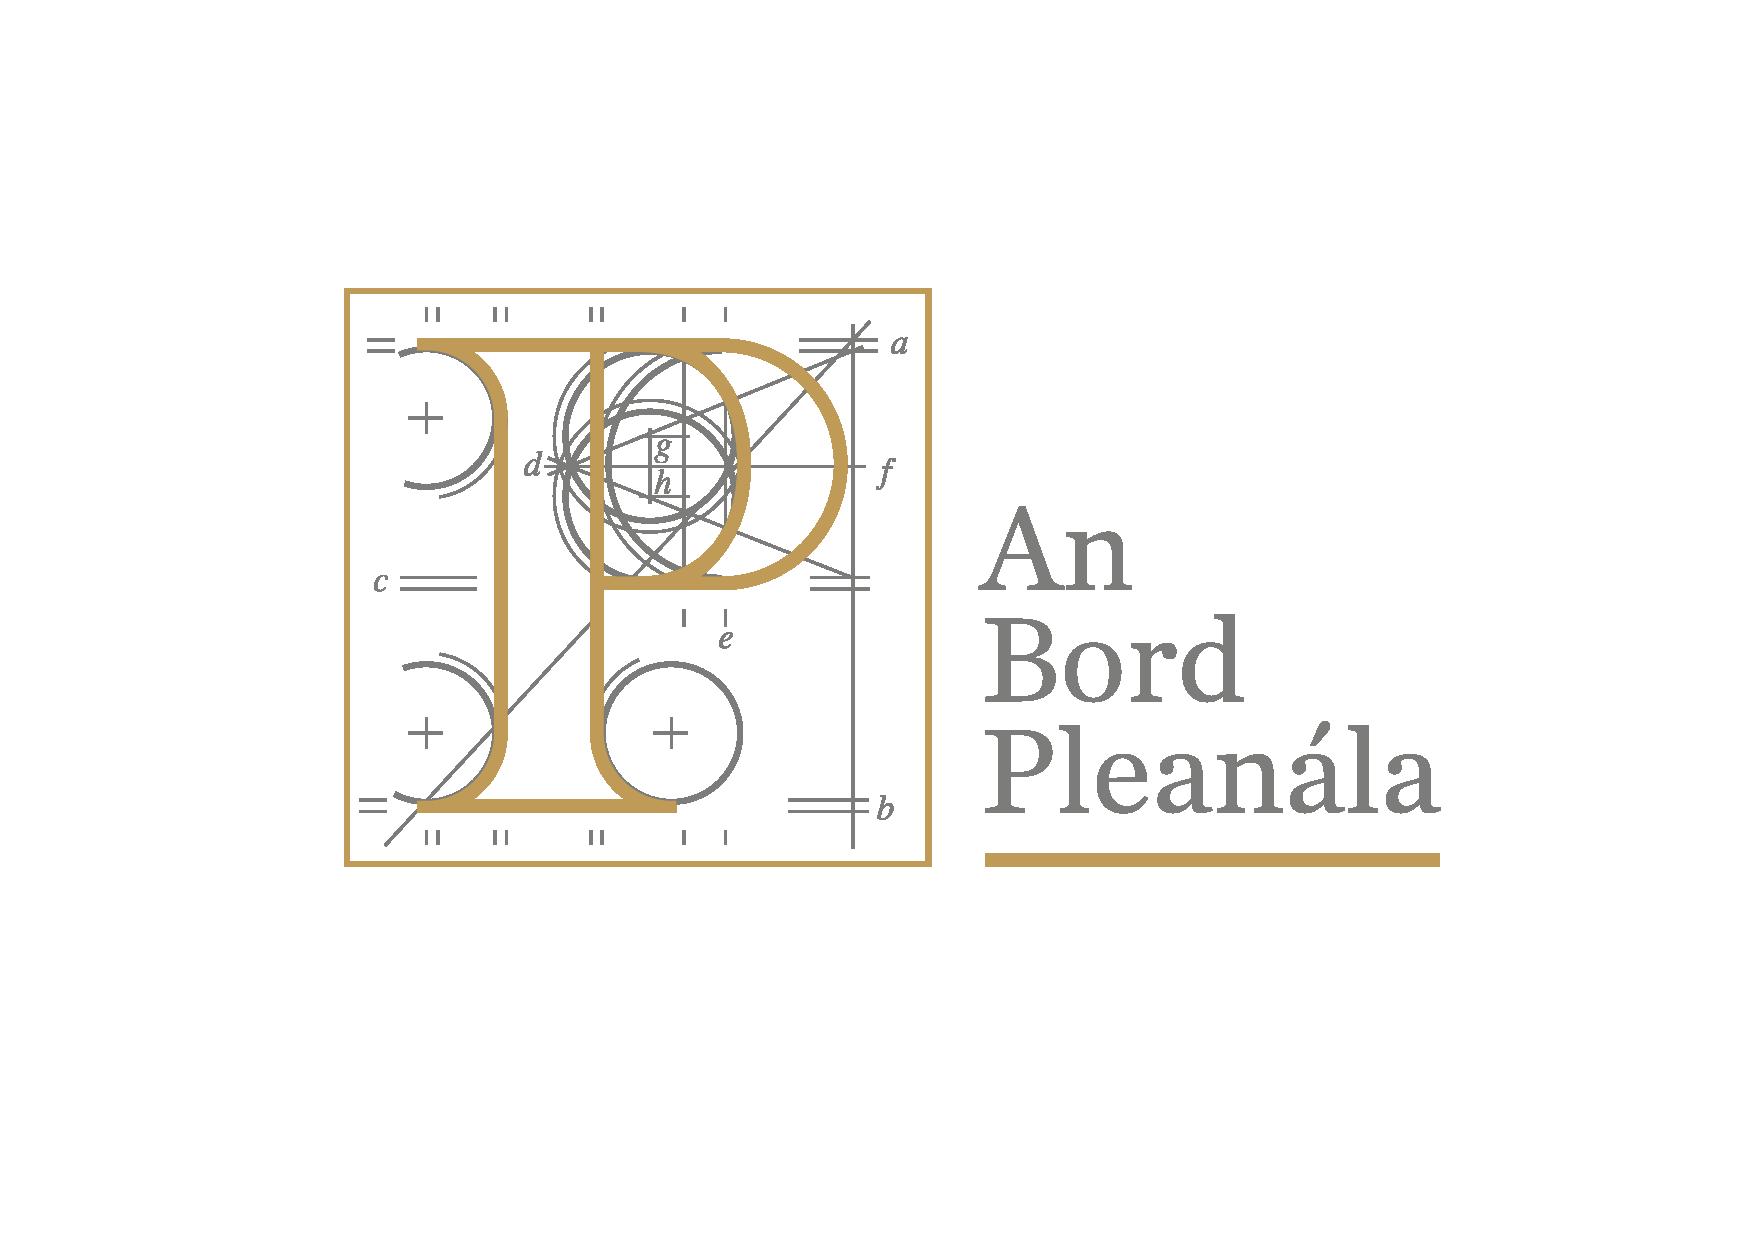 an-bord-pleanala